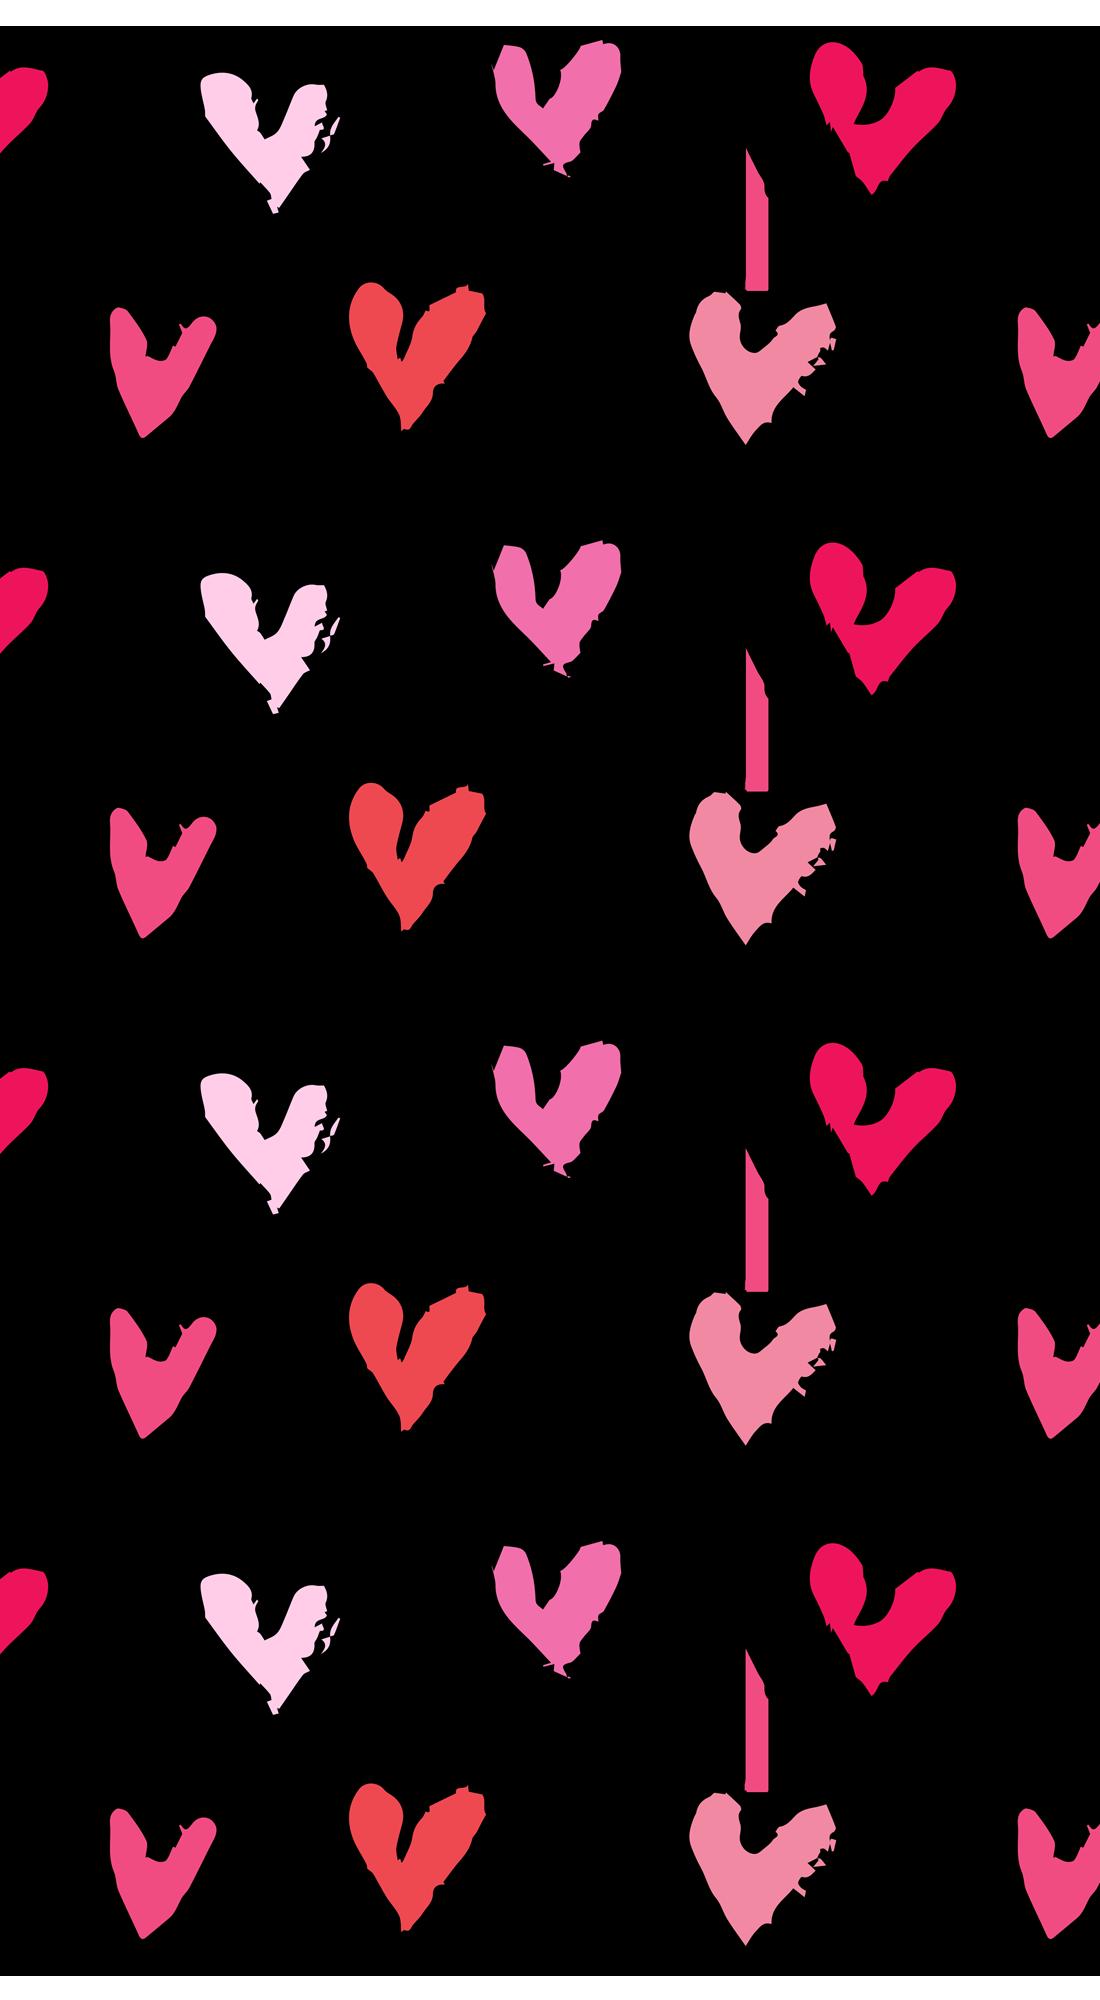 Hearts Casetify Iphone Art Design Cute Heart Iphone Background Art Valentines Wallpaper Iphone Wallpaper